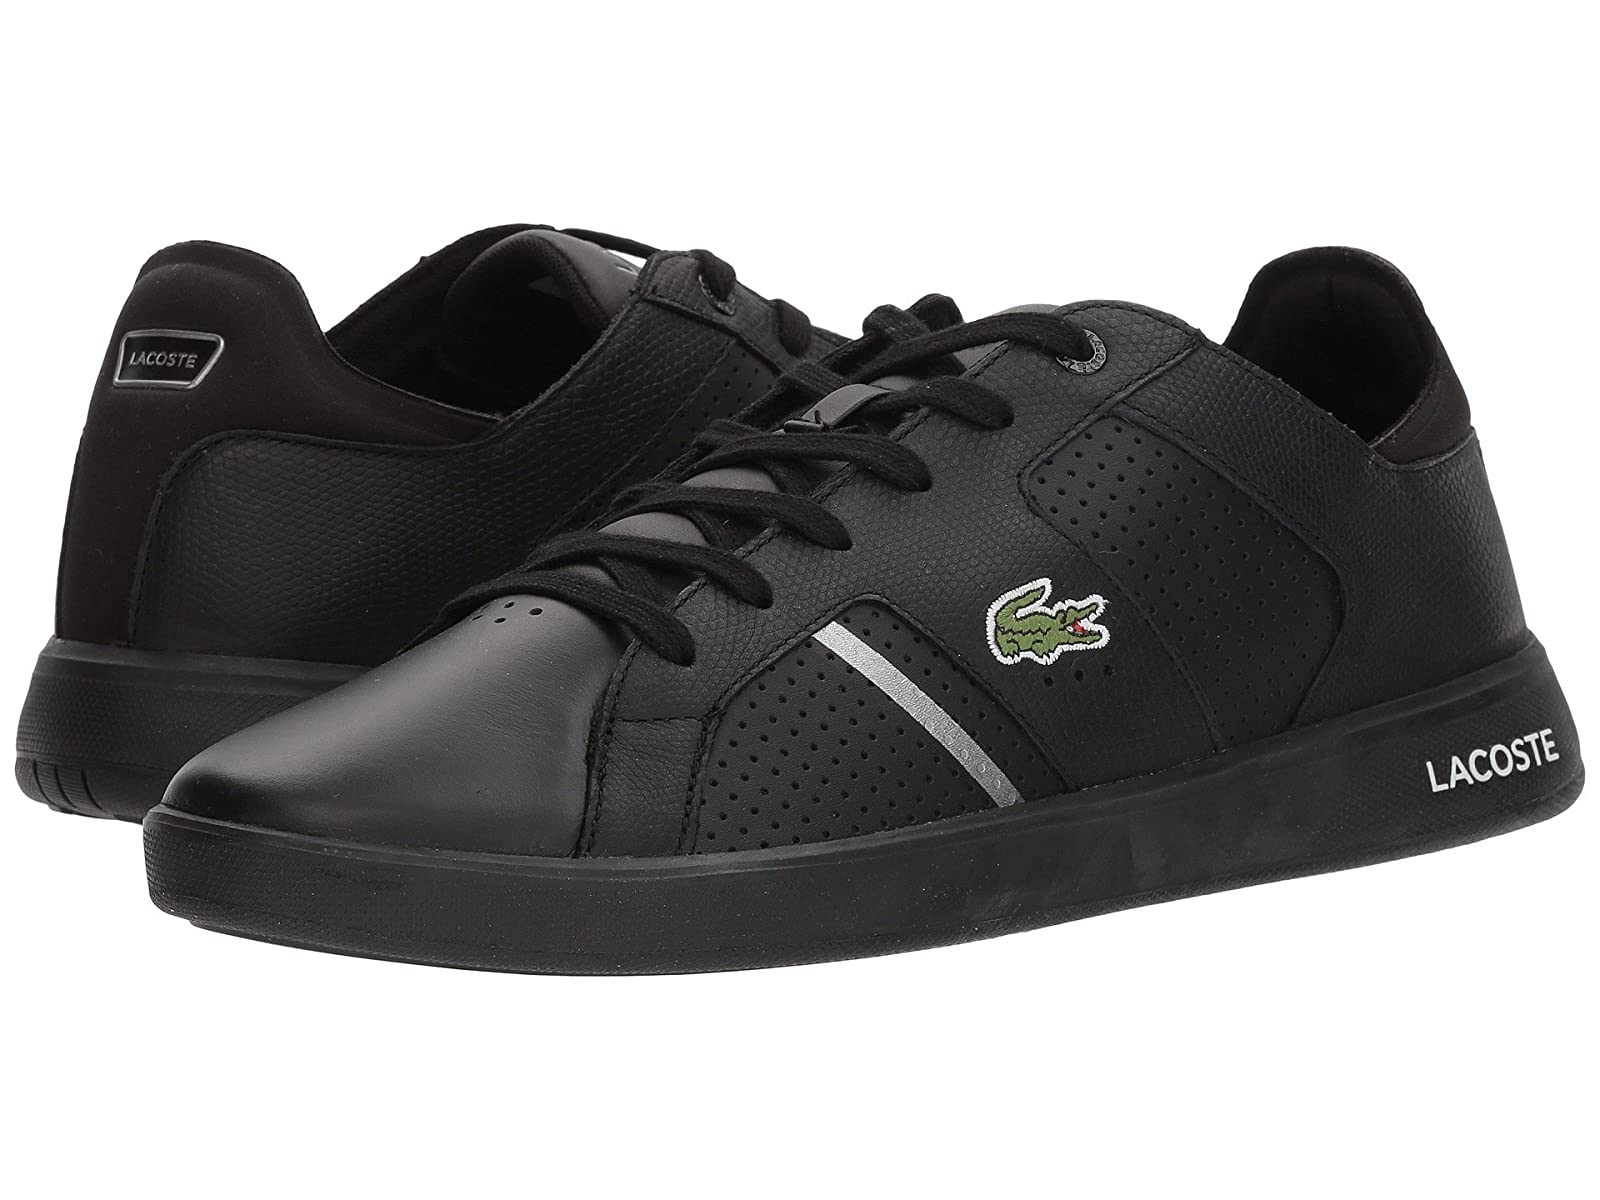 Lacoste Novas CT 118 2Atmospheric grades have affordable shoes